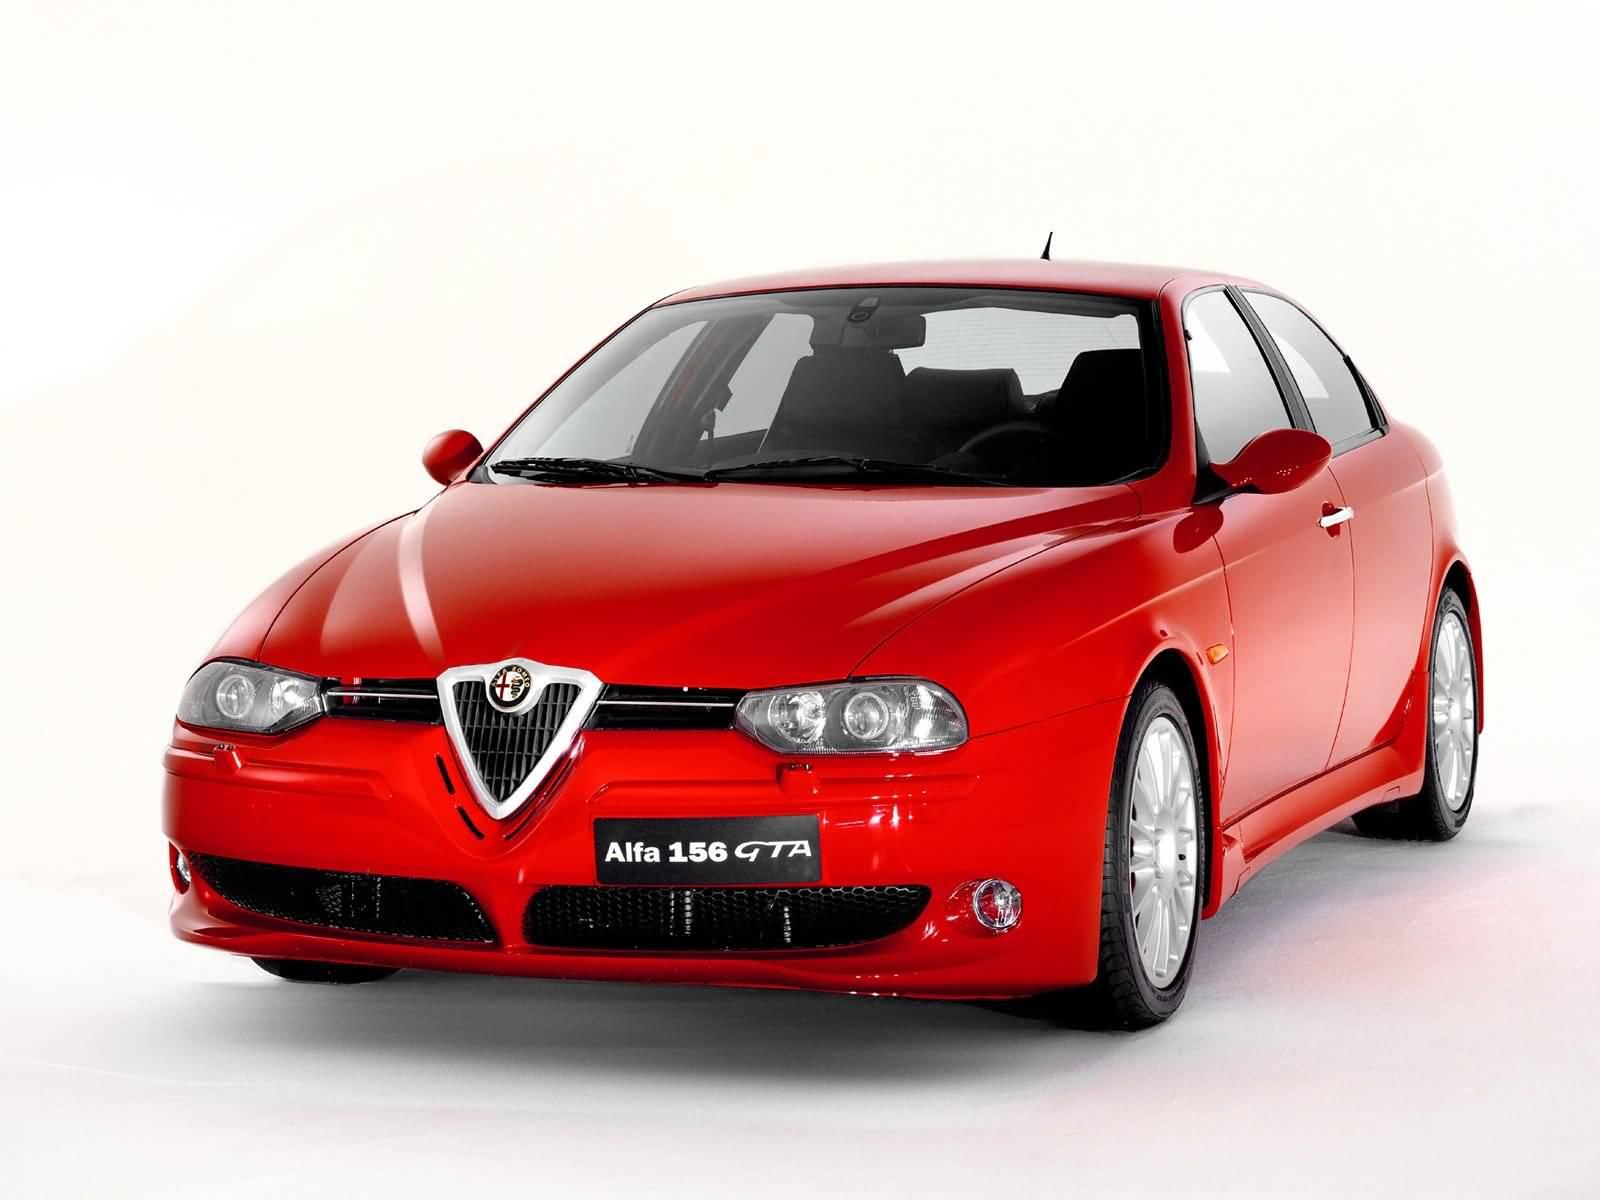 Most popular red Alfa Romeo 156 GTA Car